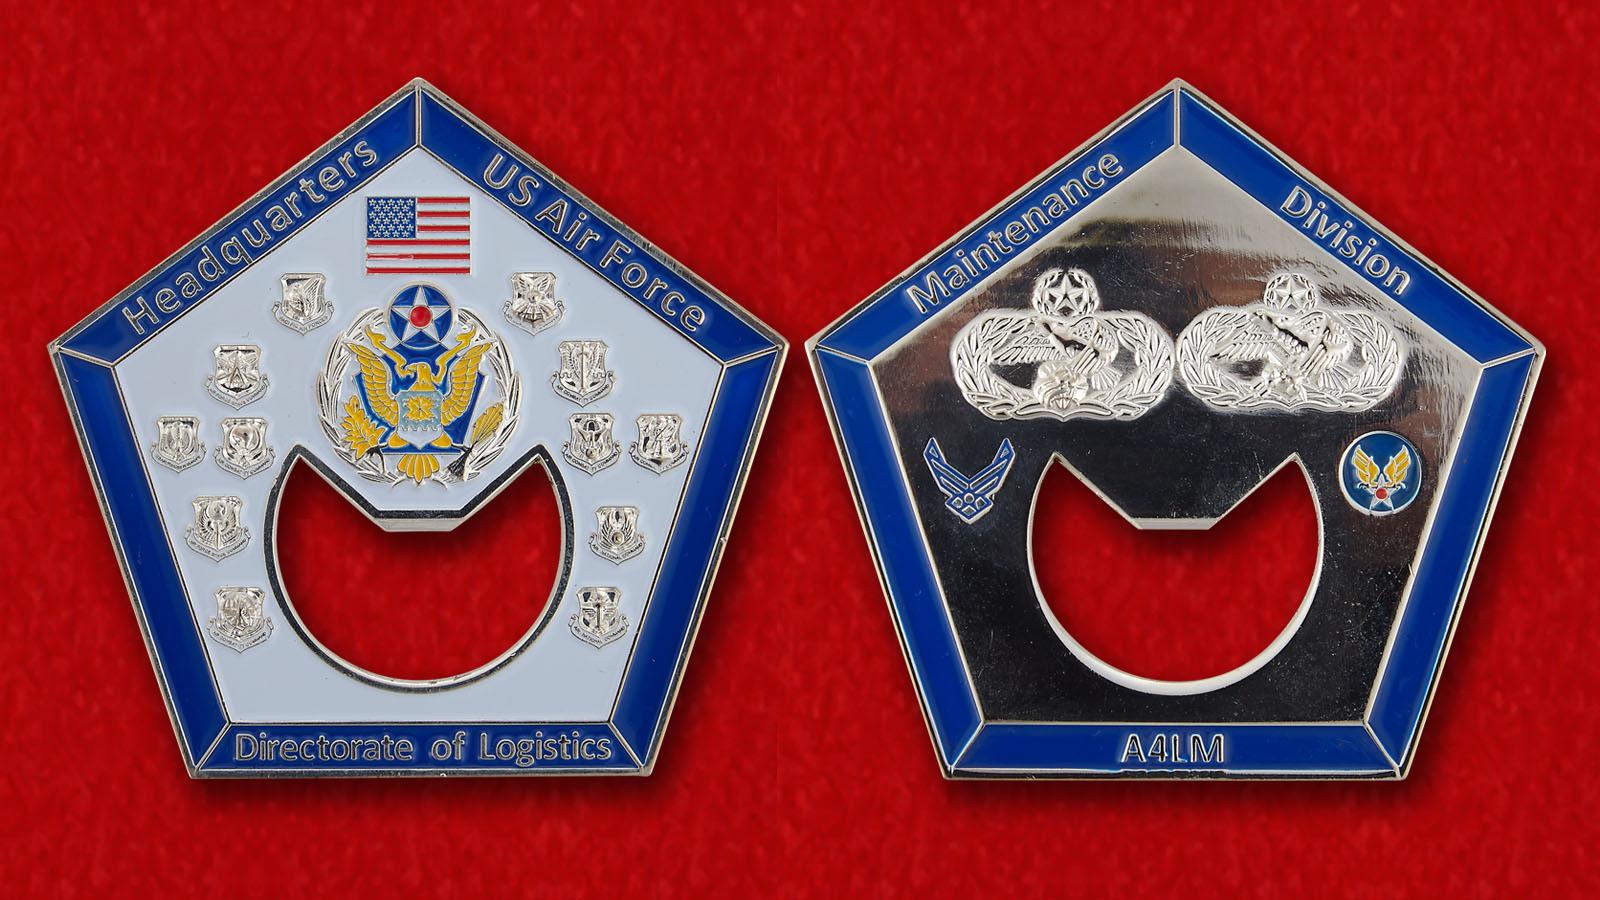 Челлендж коин-открывалка Управления снабжения при Штаб-квартире ВВС США - аверс и реверс